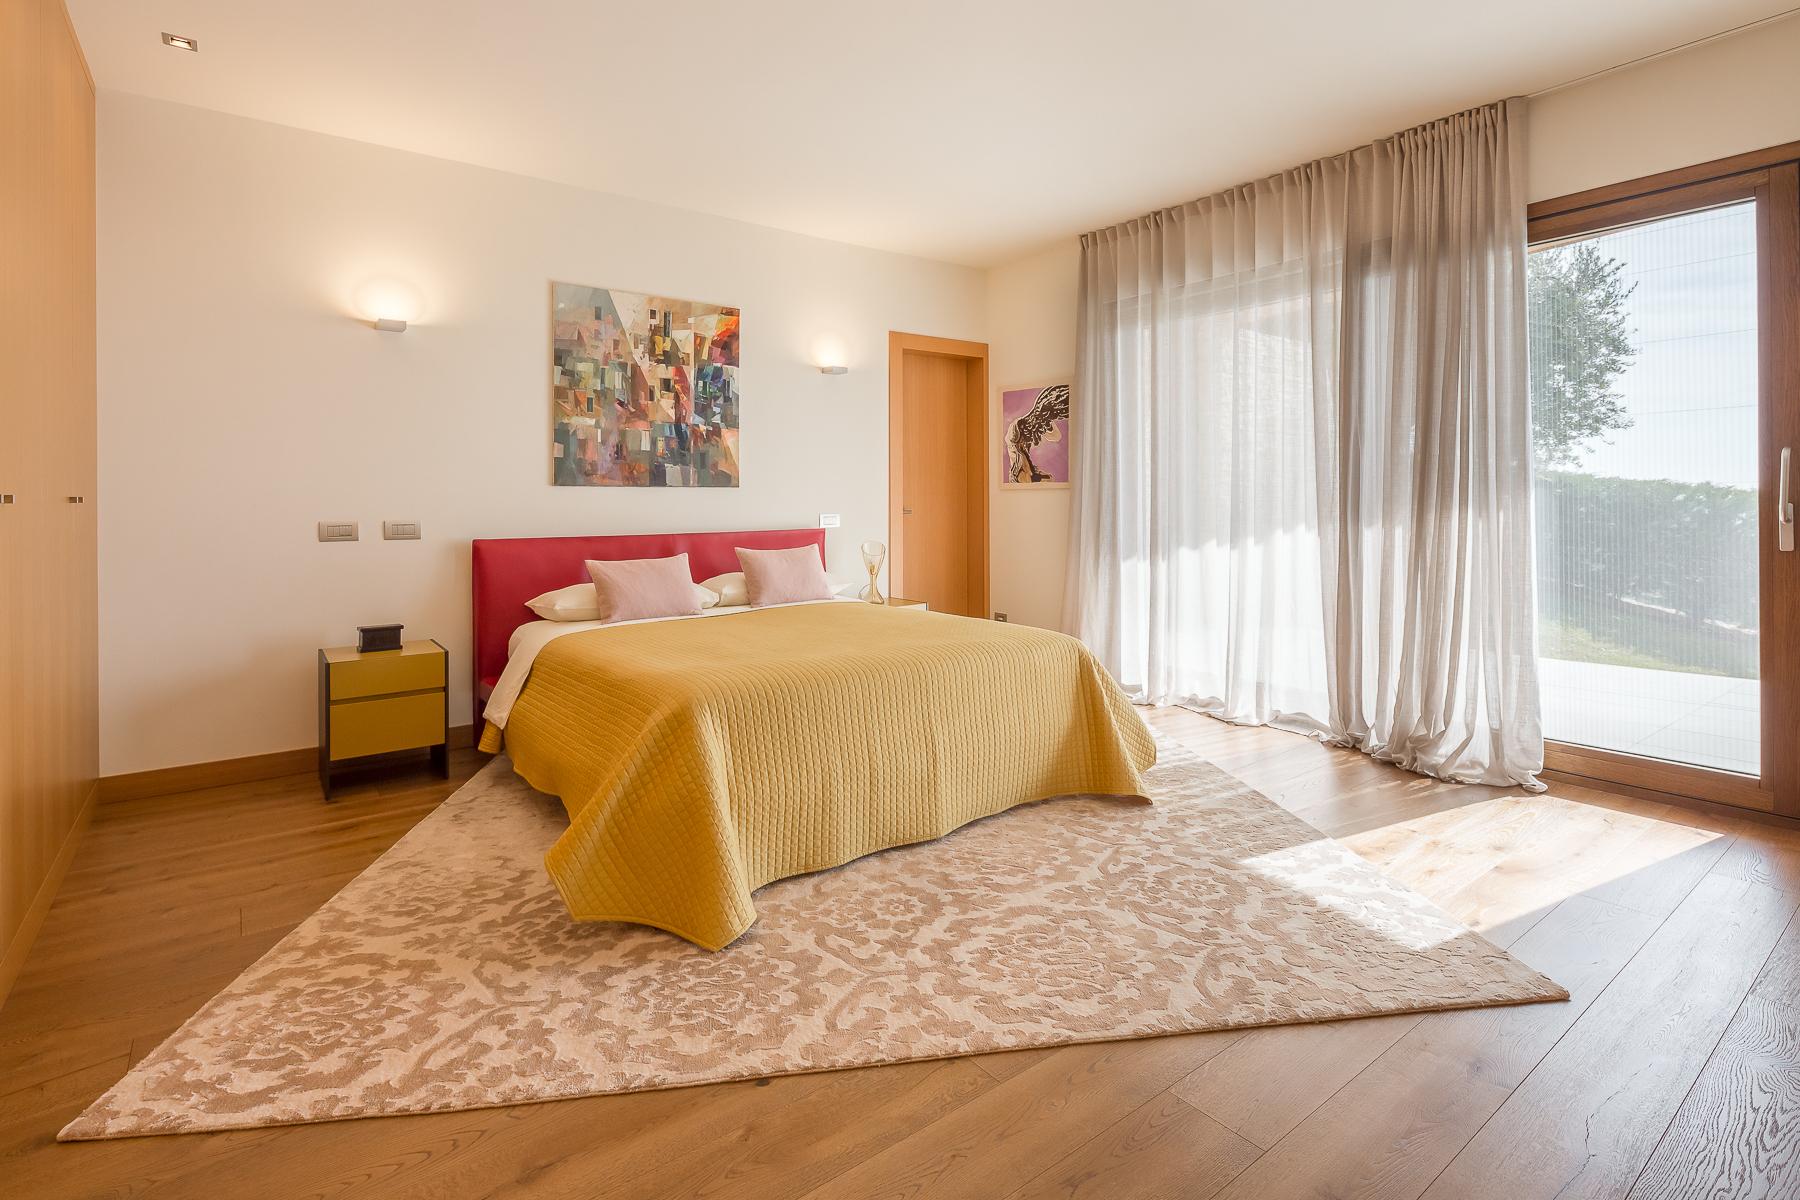 Villa in Vendita a Verona: 5 locali, 630 mq - Foto 11